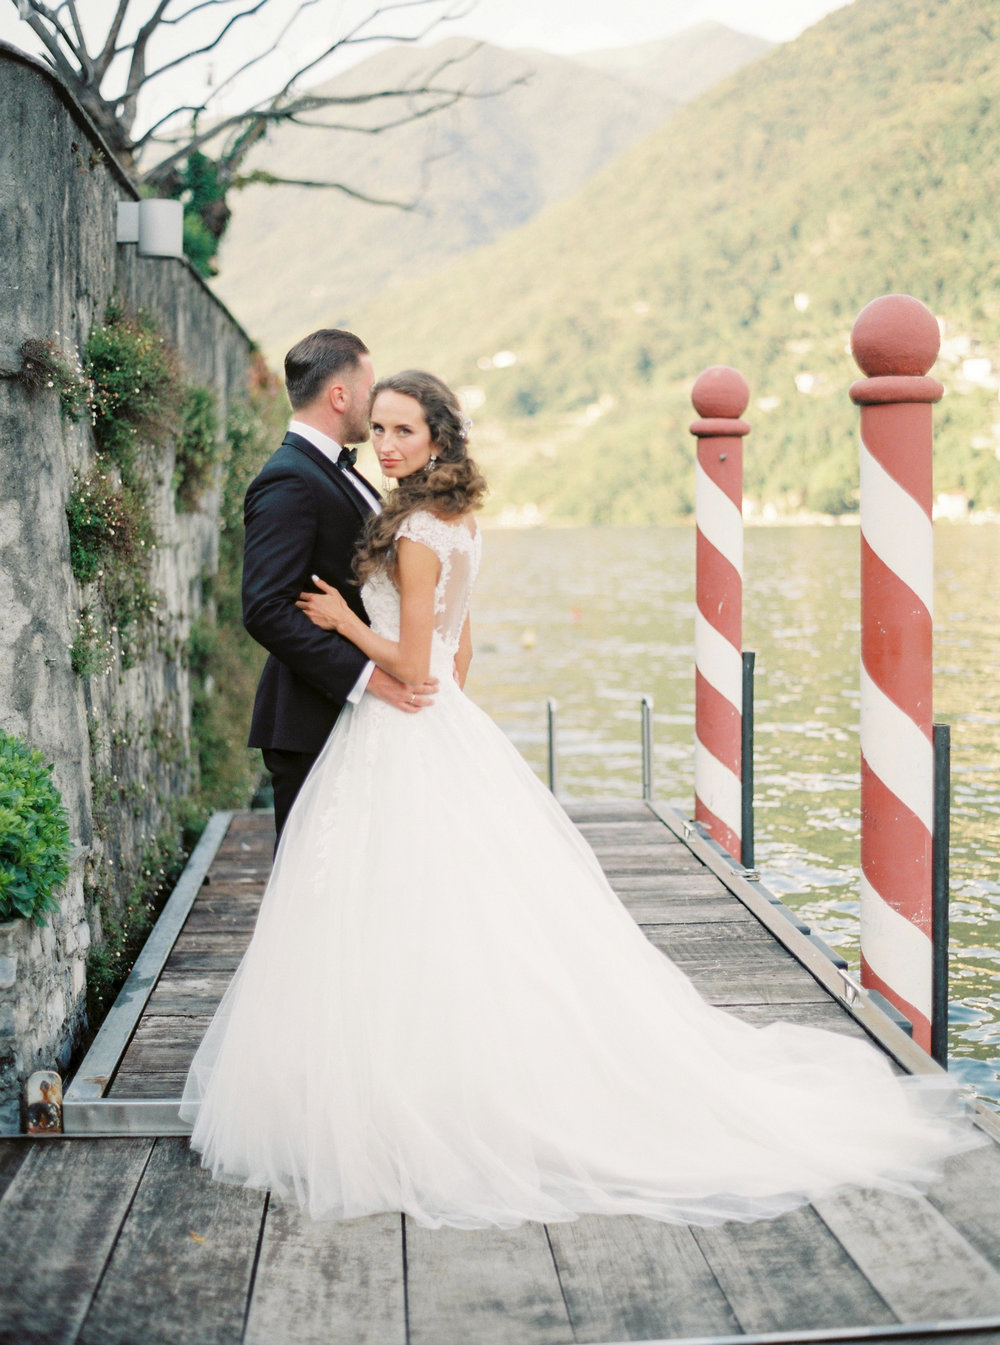 darya kamalova thecablookfotolab fine art film fhotographer in italy destination wedding como lake villa regina teodolinda villa pisani scalabrin-297.jpg